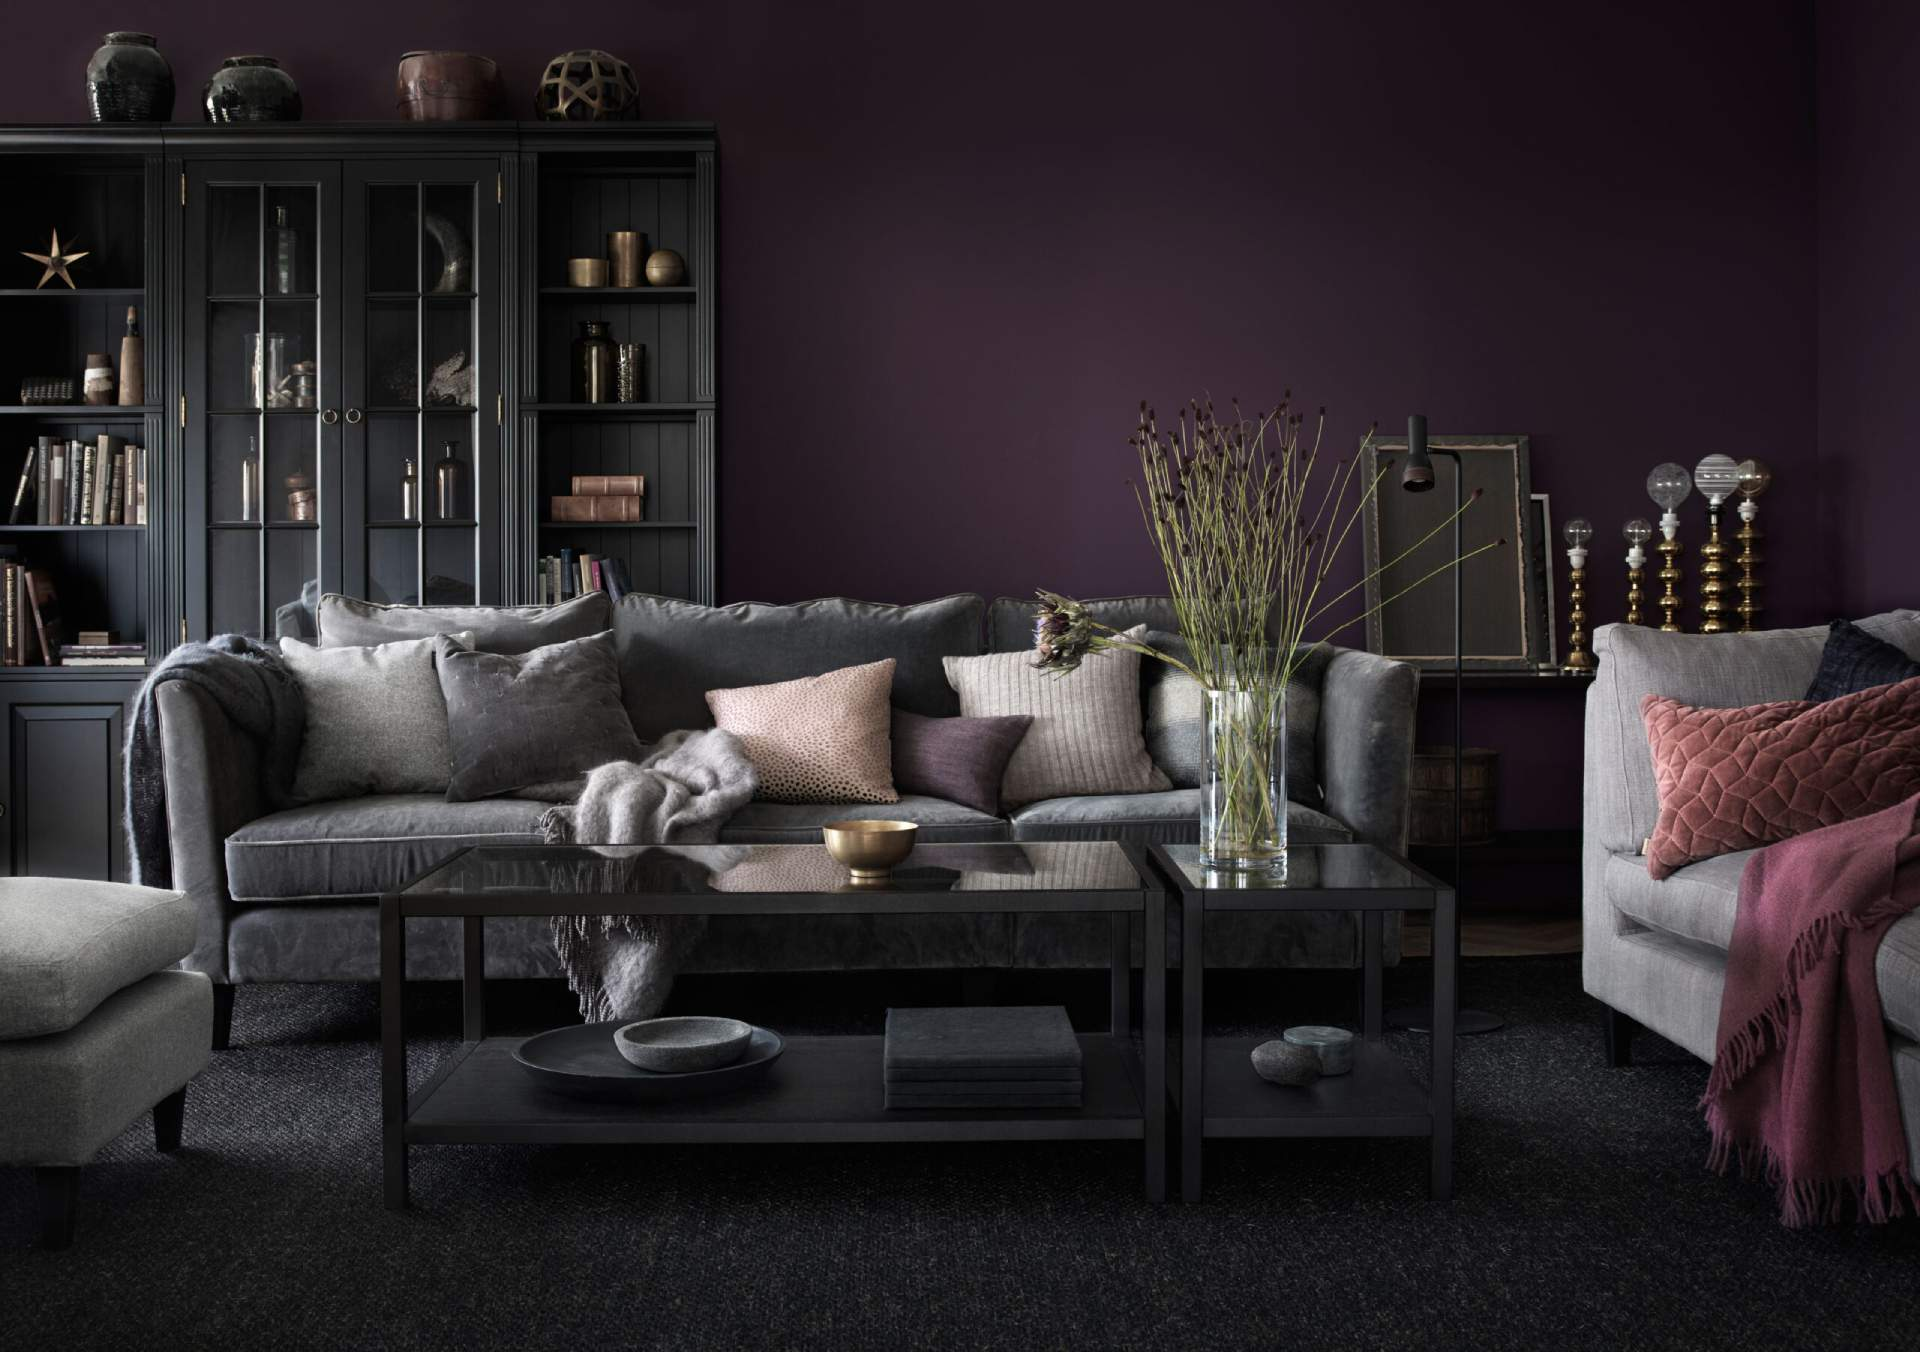 englesson stockholm sofa